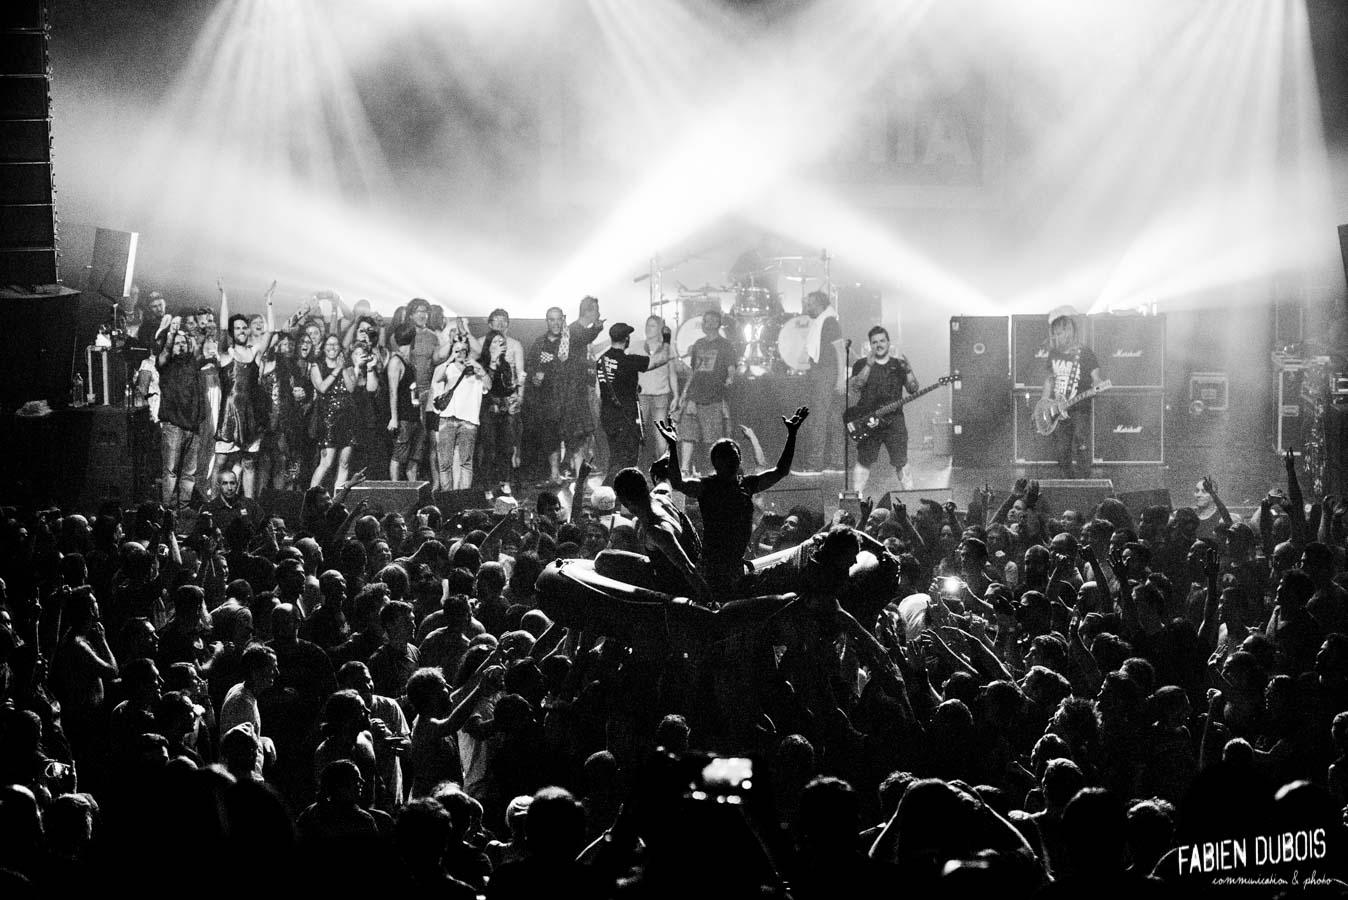 Photo Mass Hysteria Transbordeur 20 ans Médiatone Villeurbanne Lyon France 2017